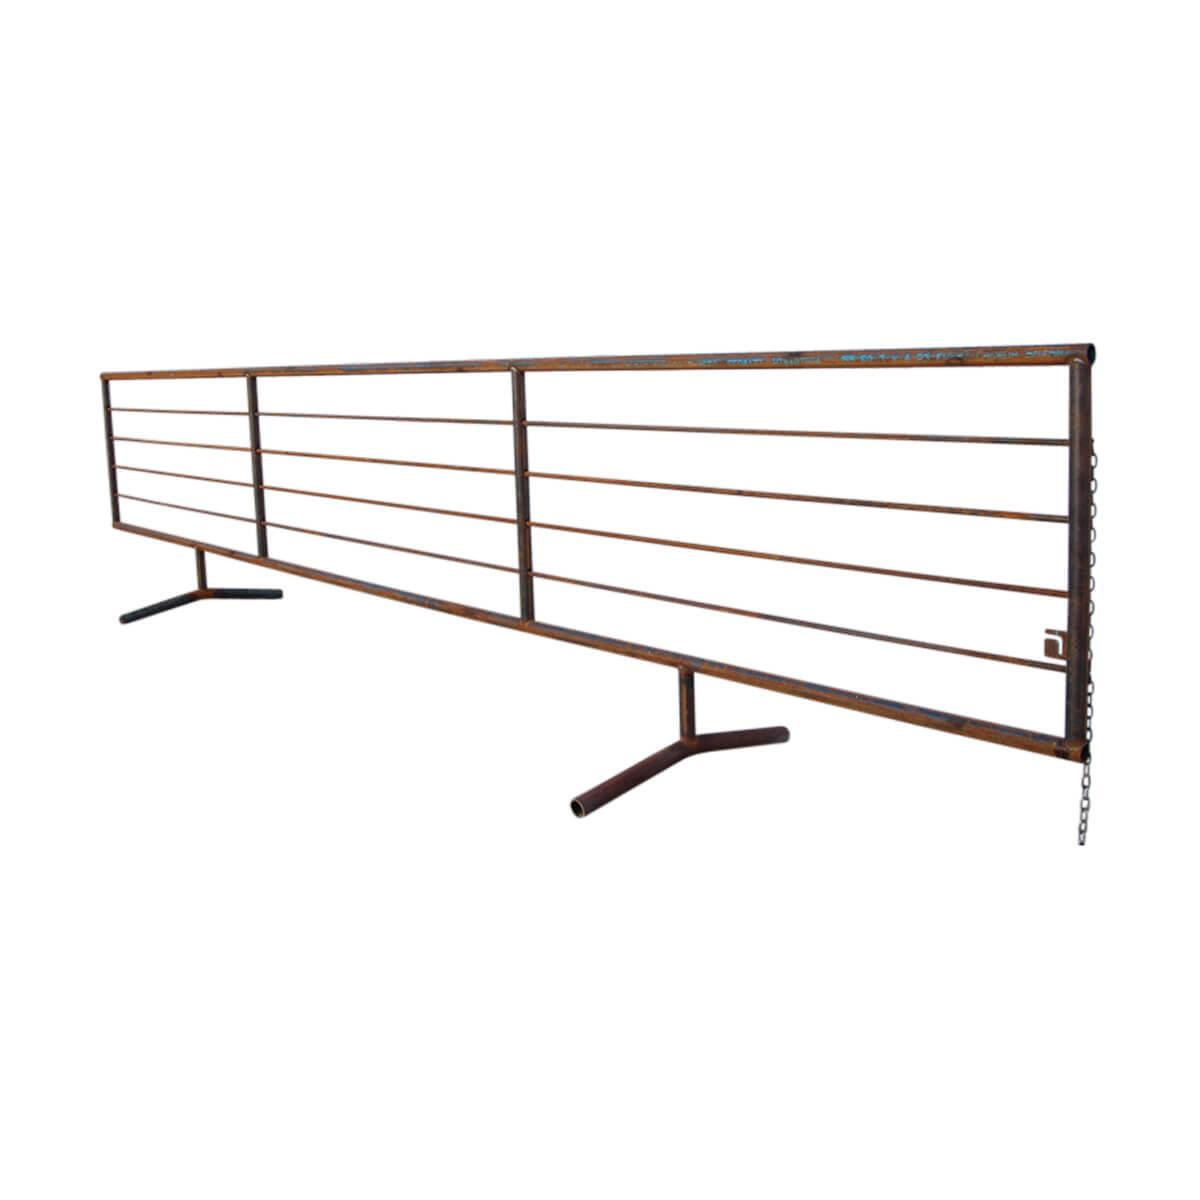 24-ft Free Standing Panel